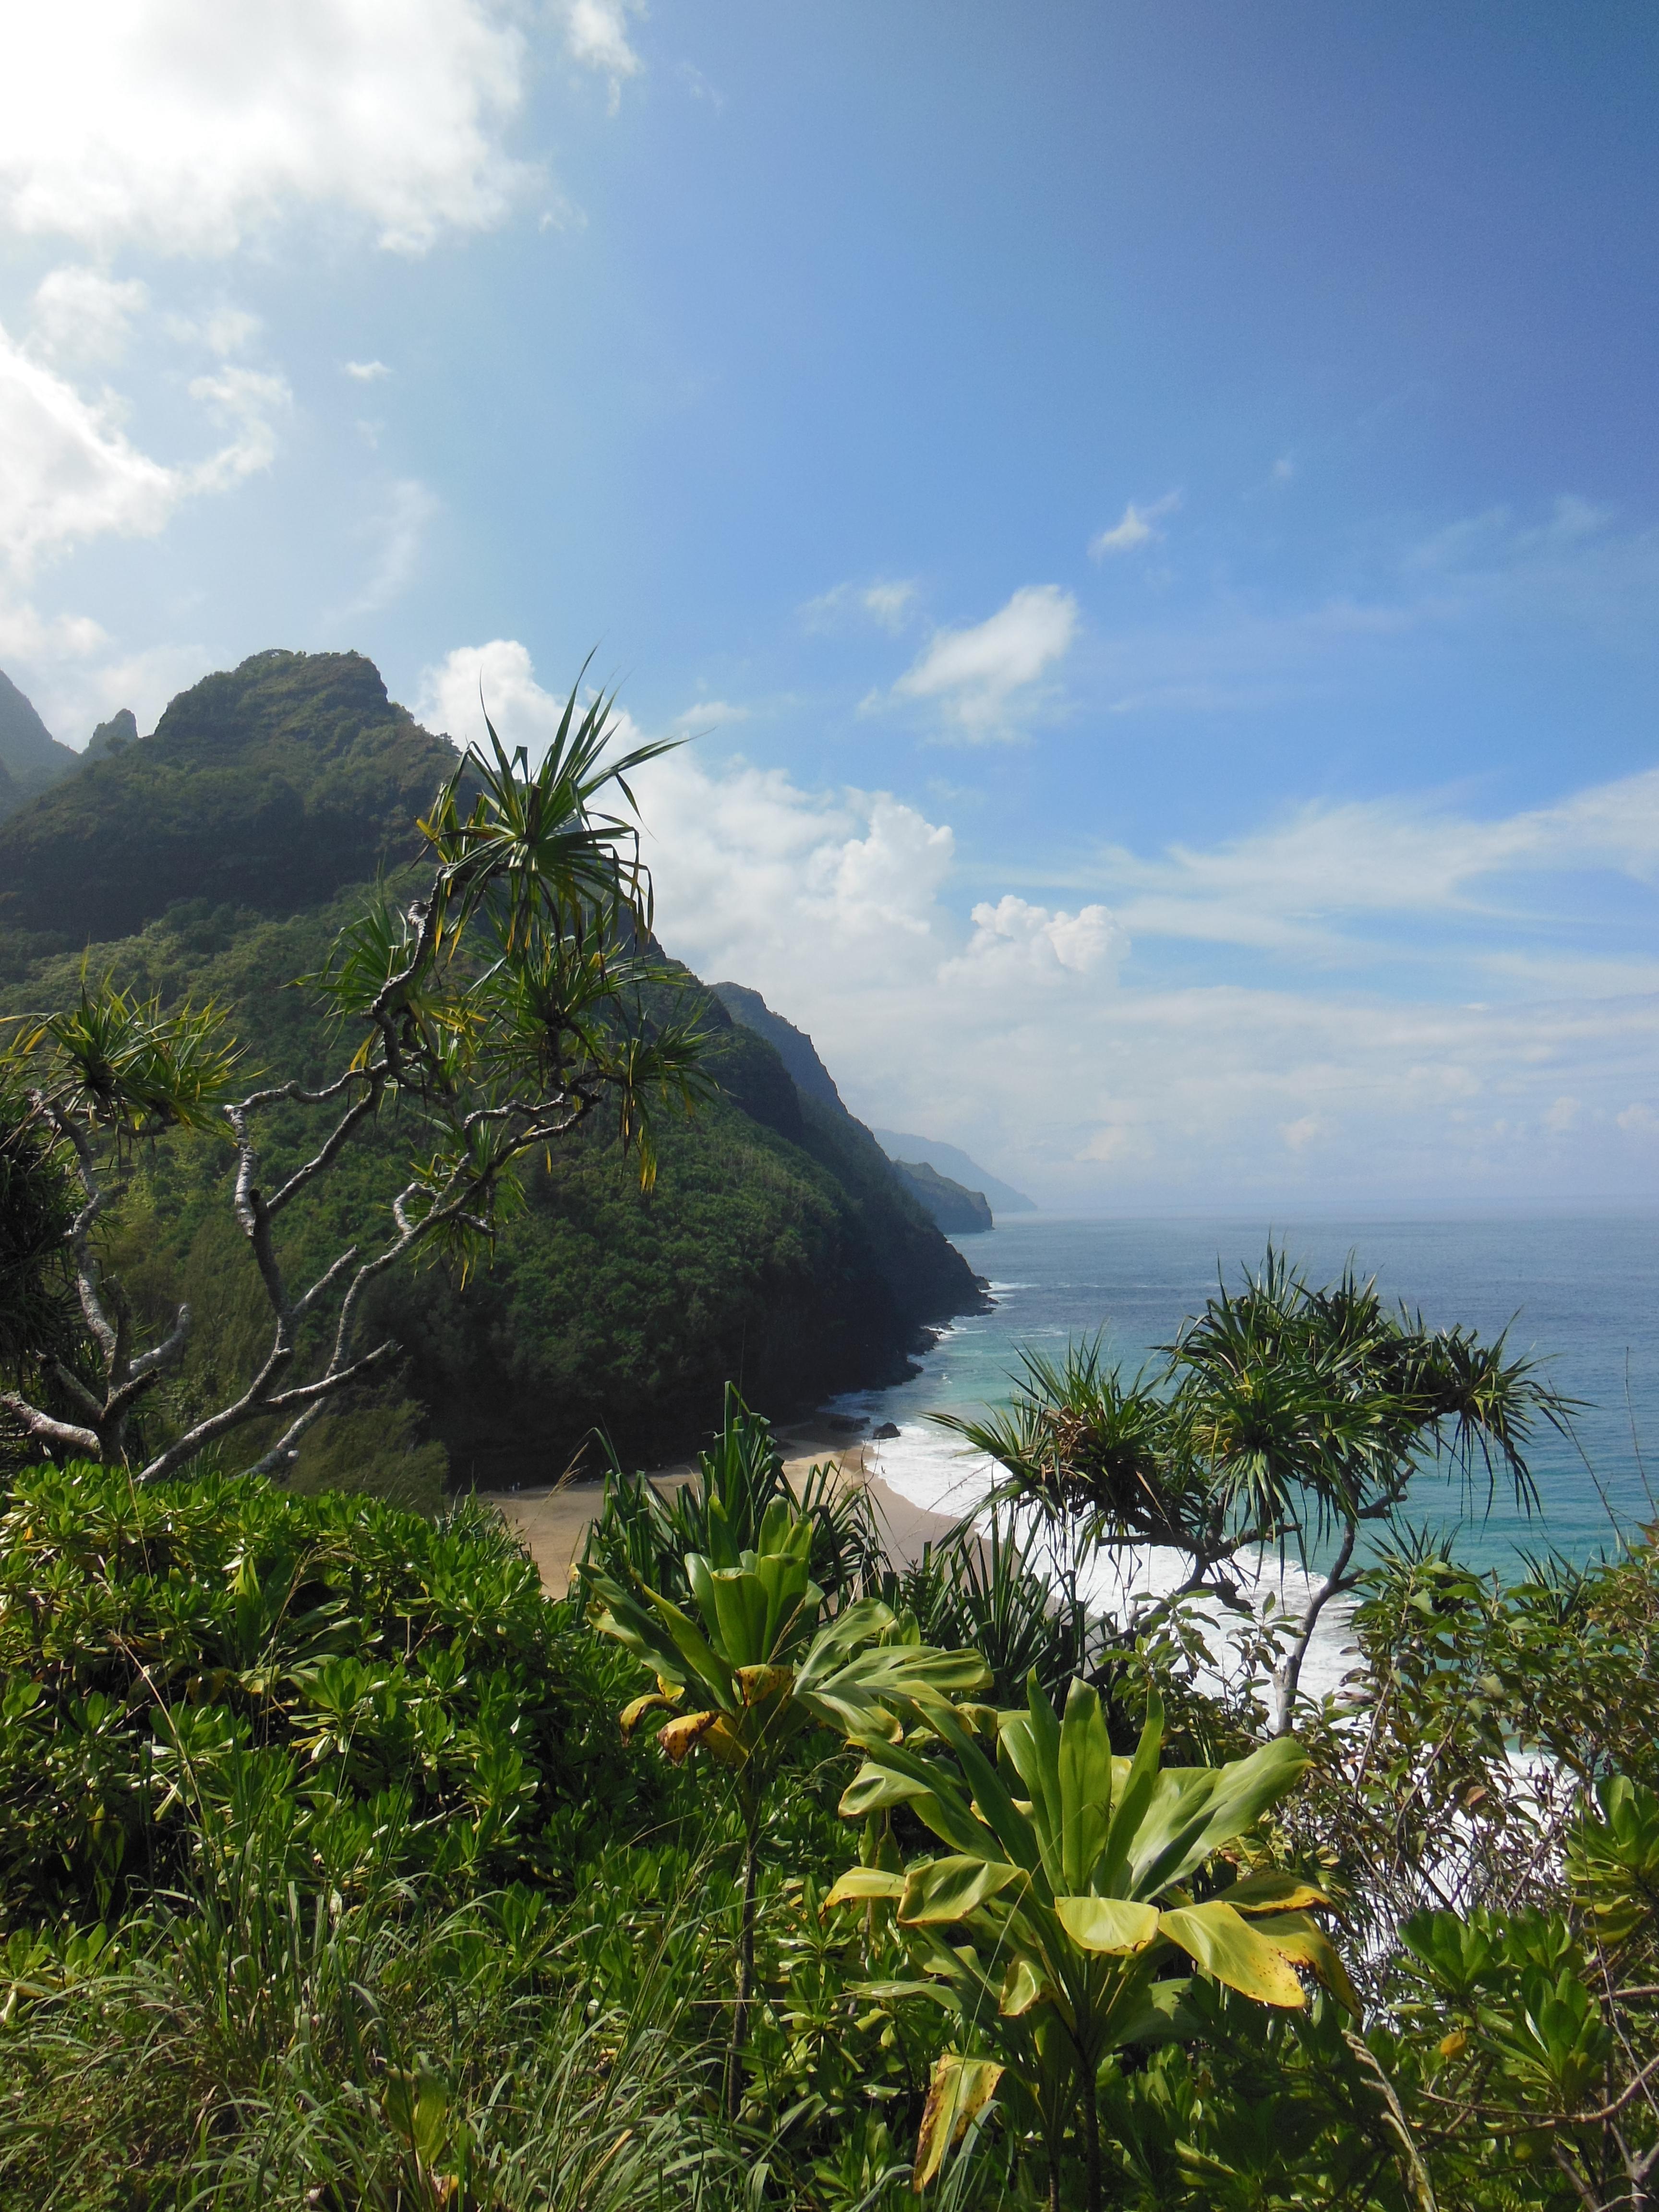 View of Hanakapiai Beach, Napali Coast on the Island of Kauai, Hawaii